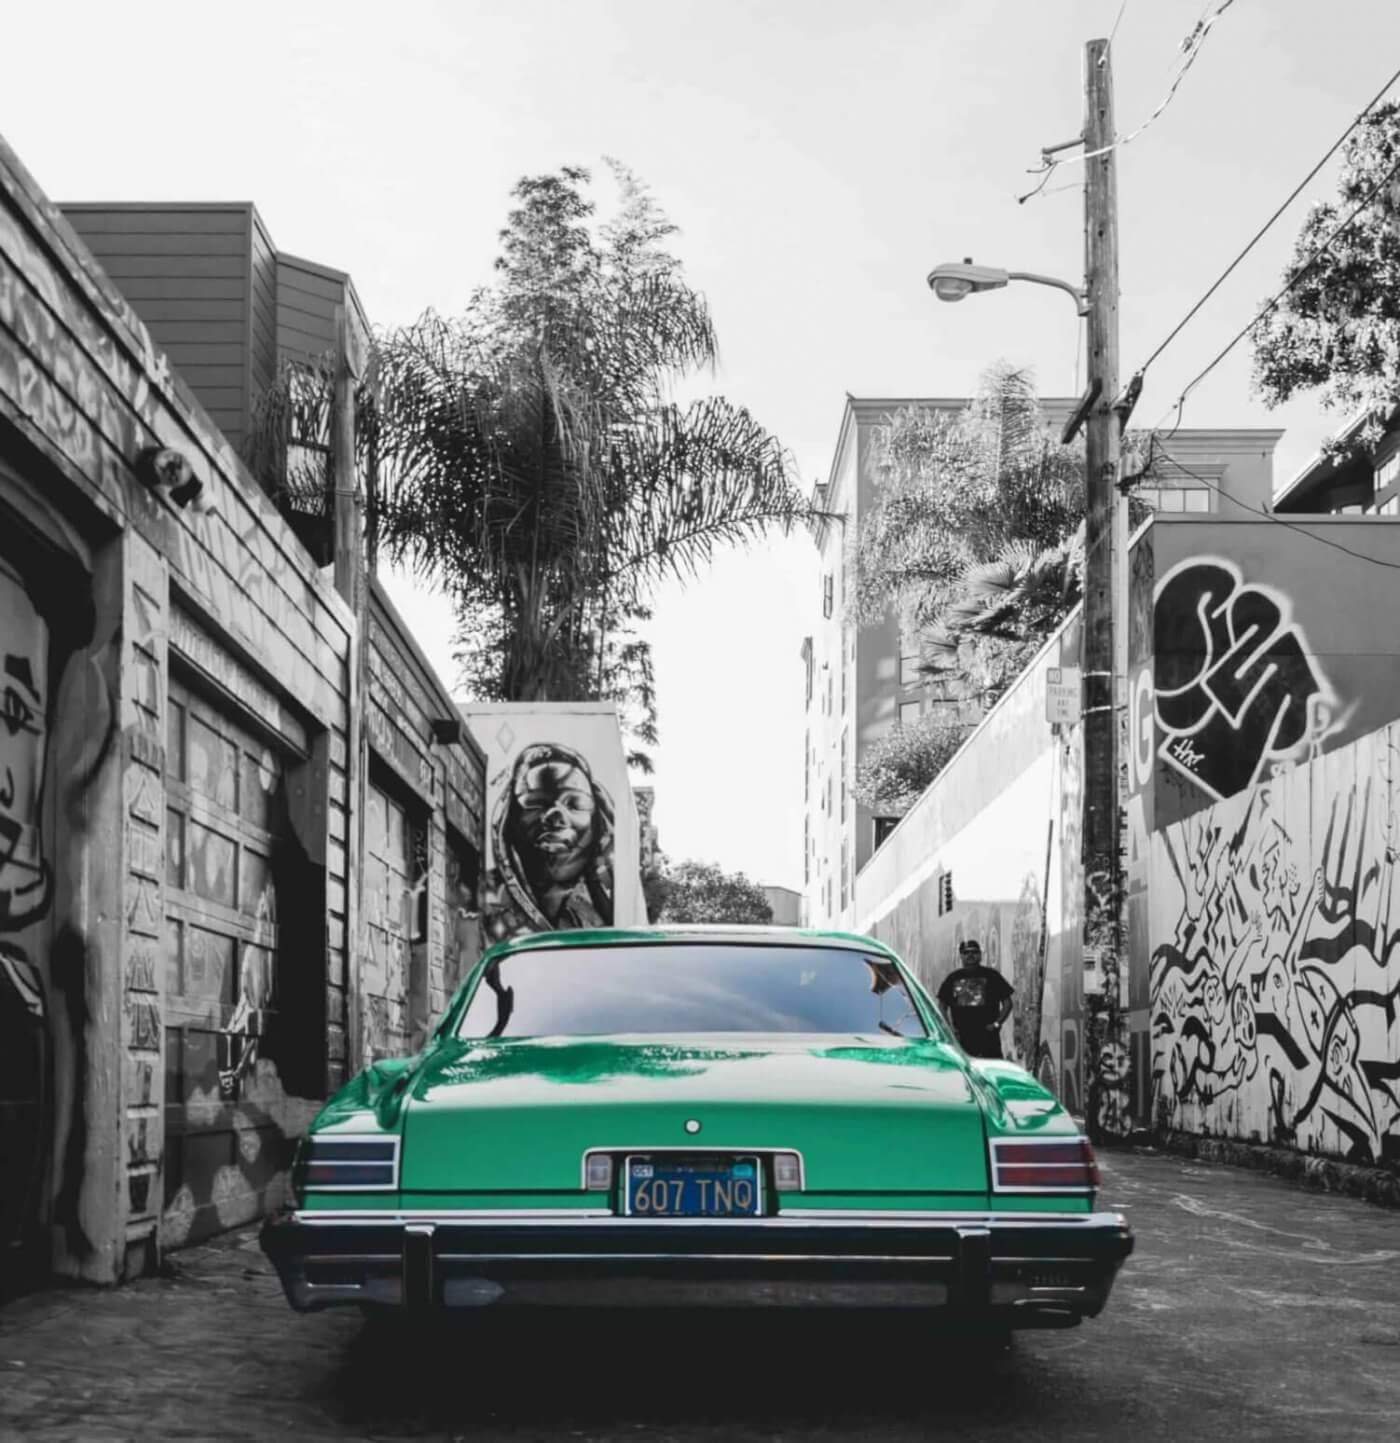 Green car in alley